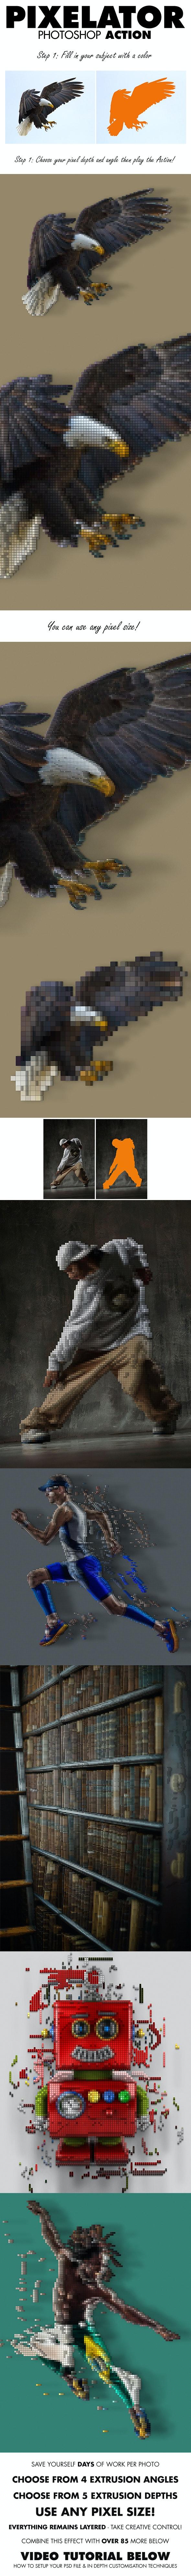 Pixelator Photoshop Action - Photo Effects Actions